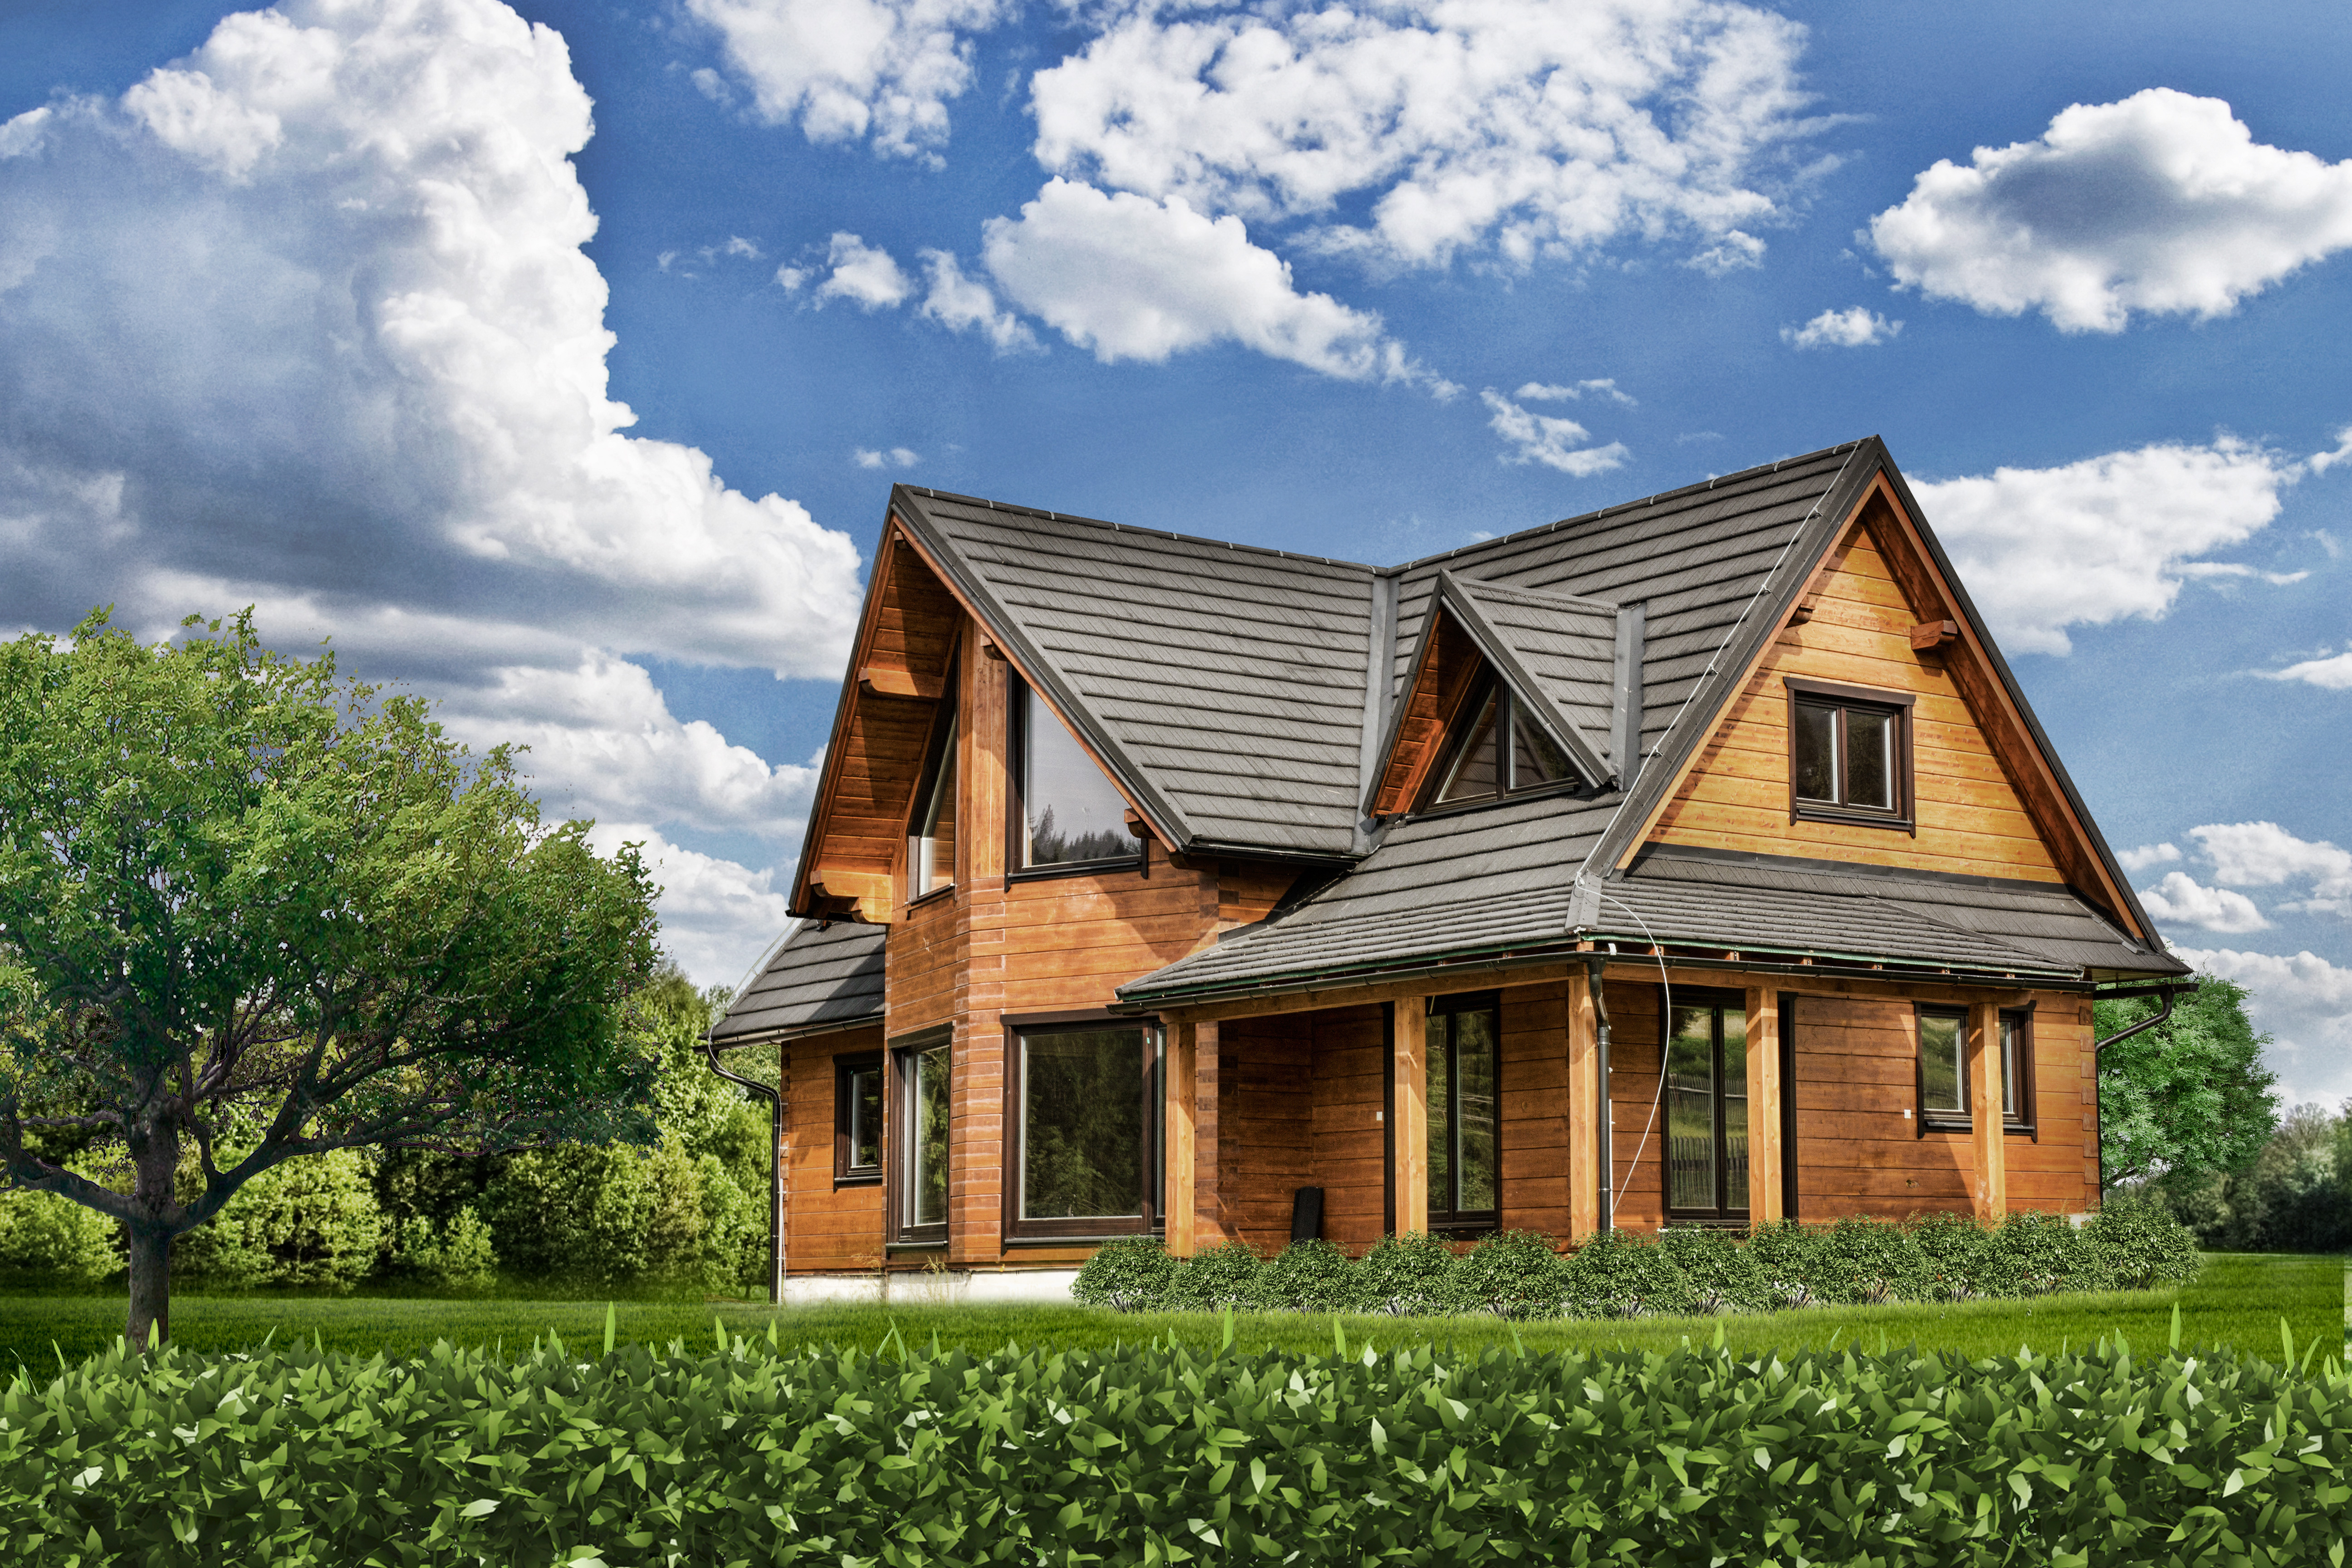 Gasparik woodhouse